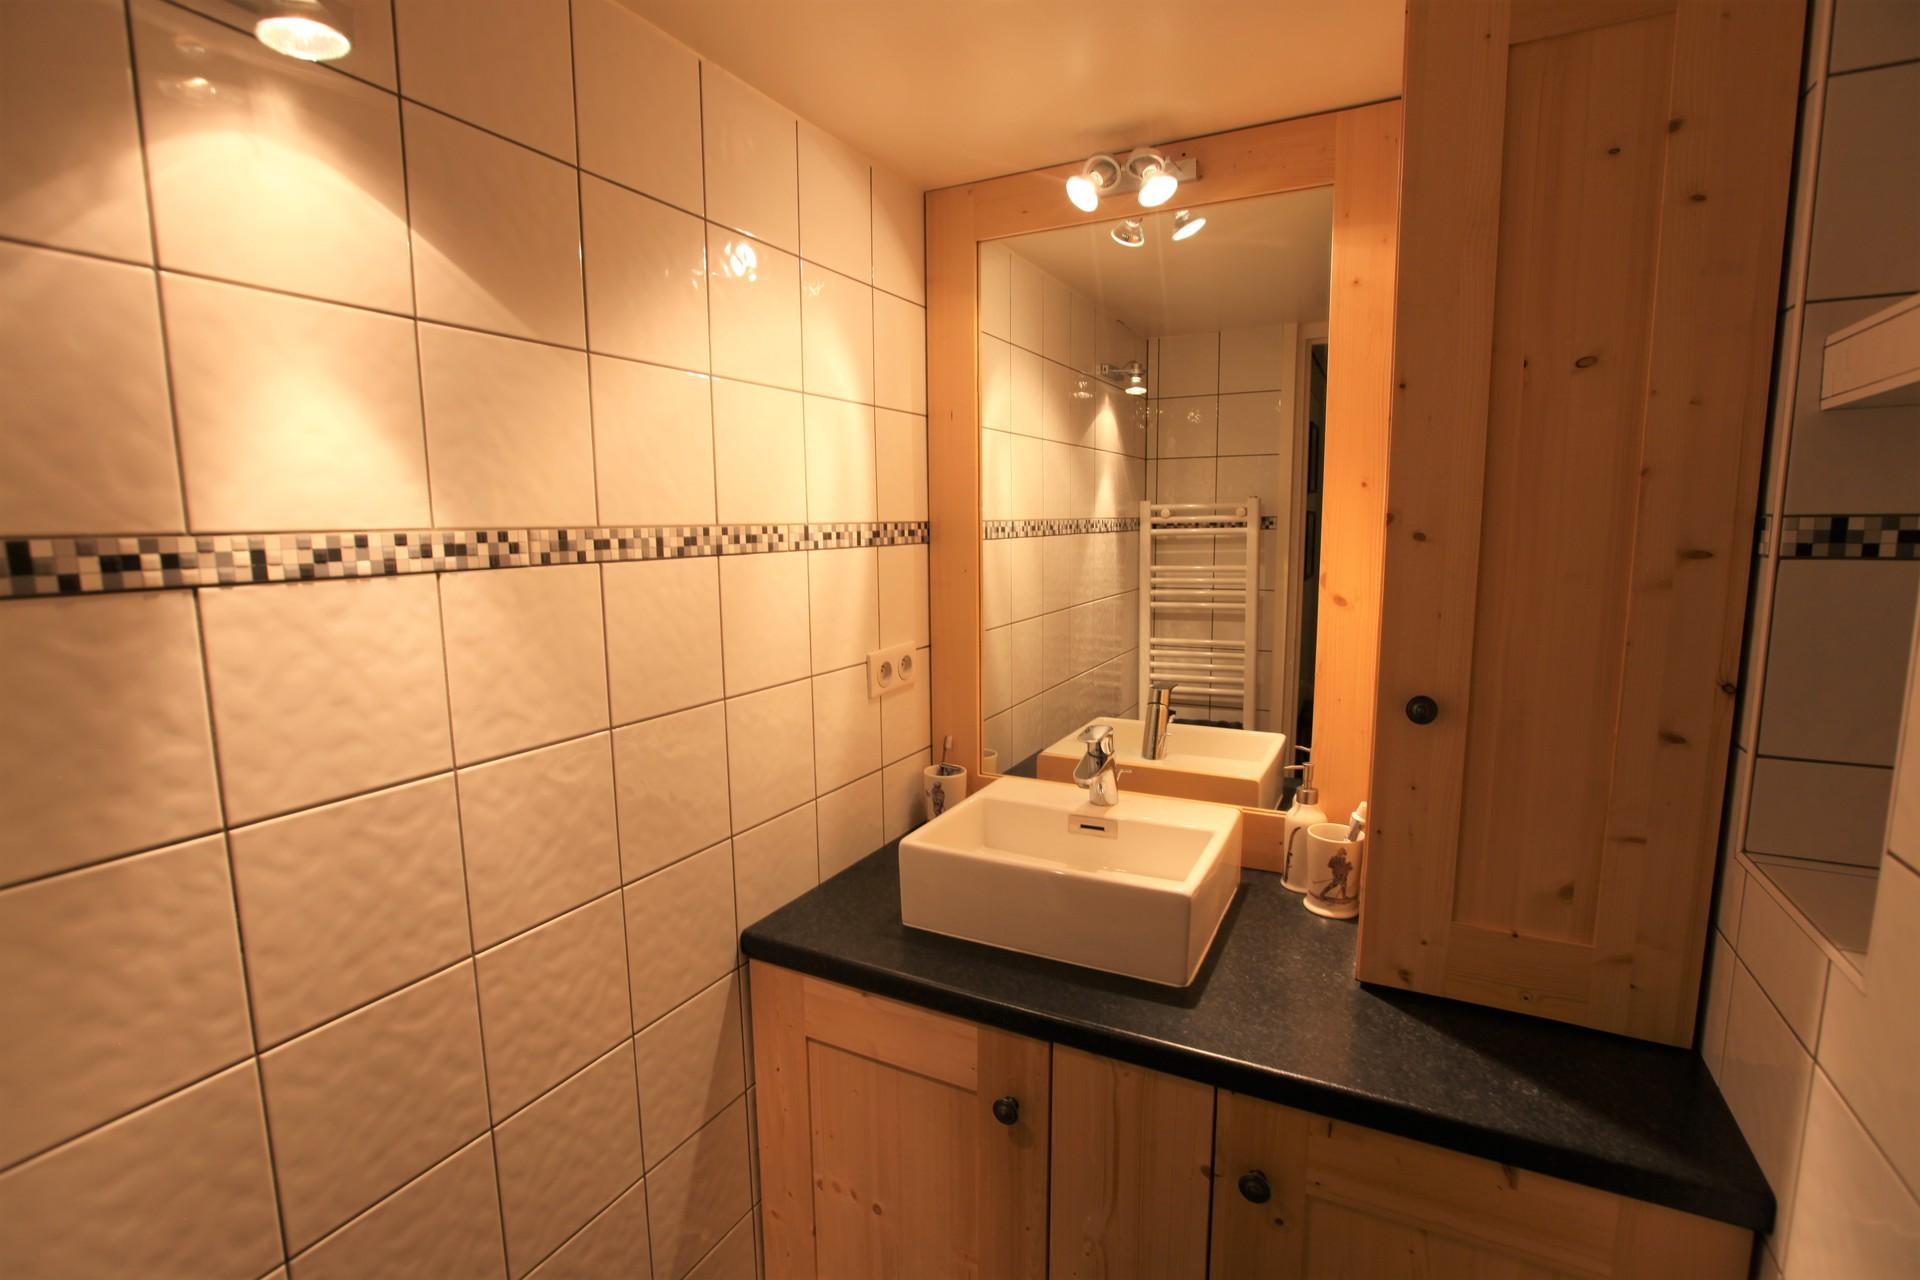 Rent a 4 rooms (3 bedrooms) at Avoriaz